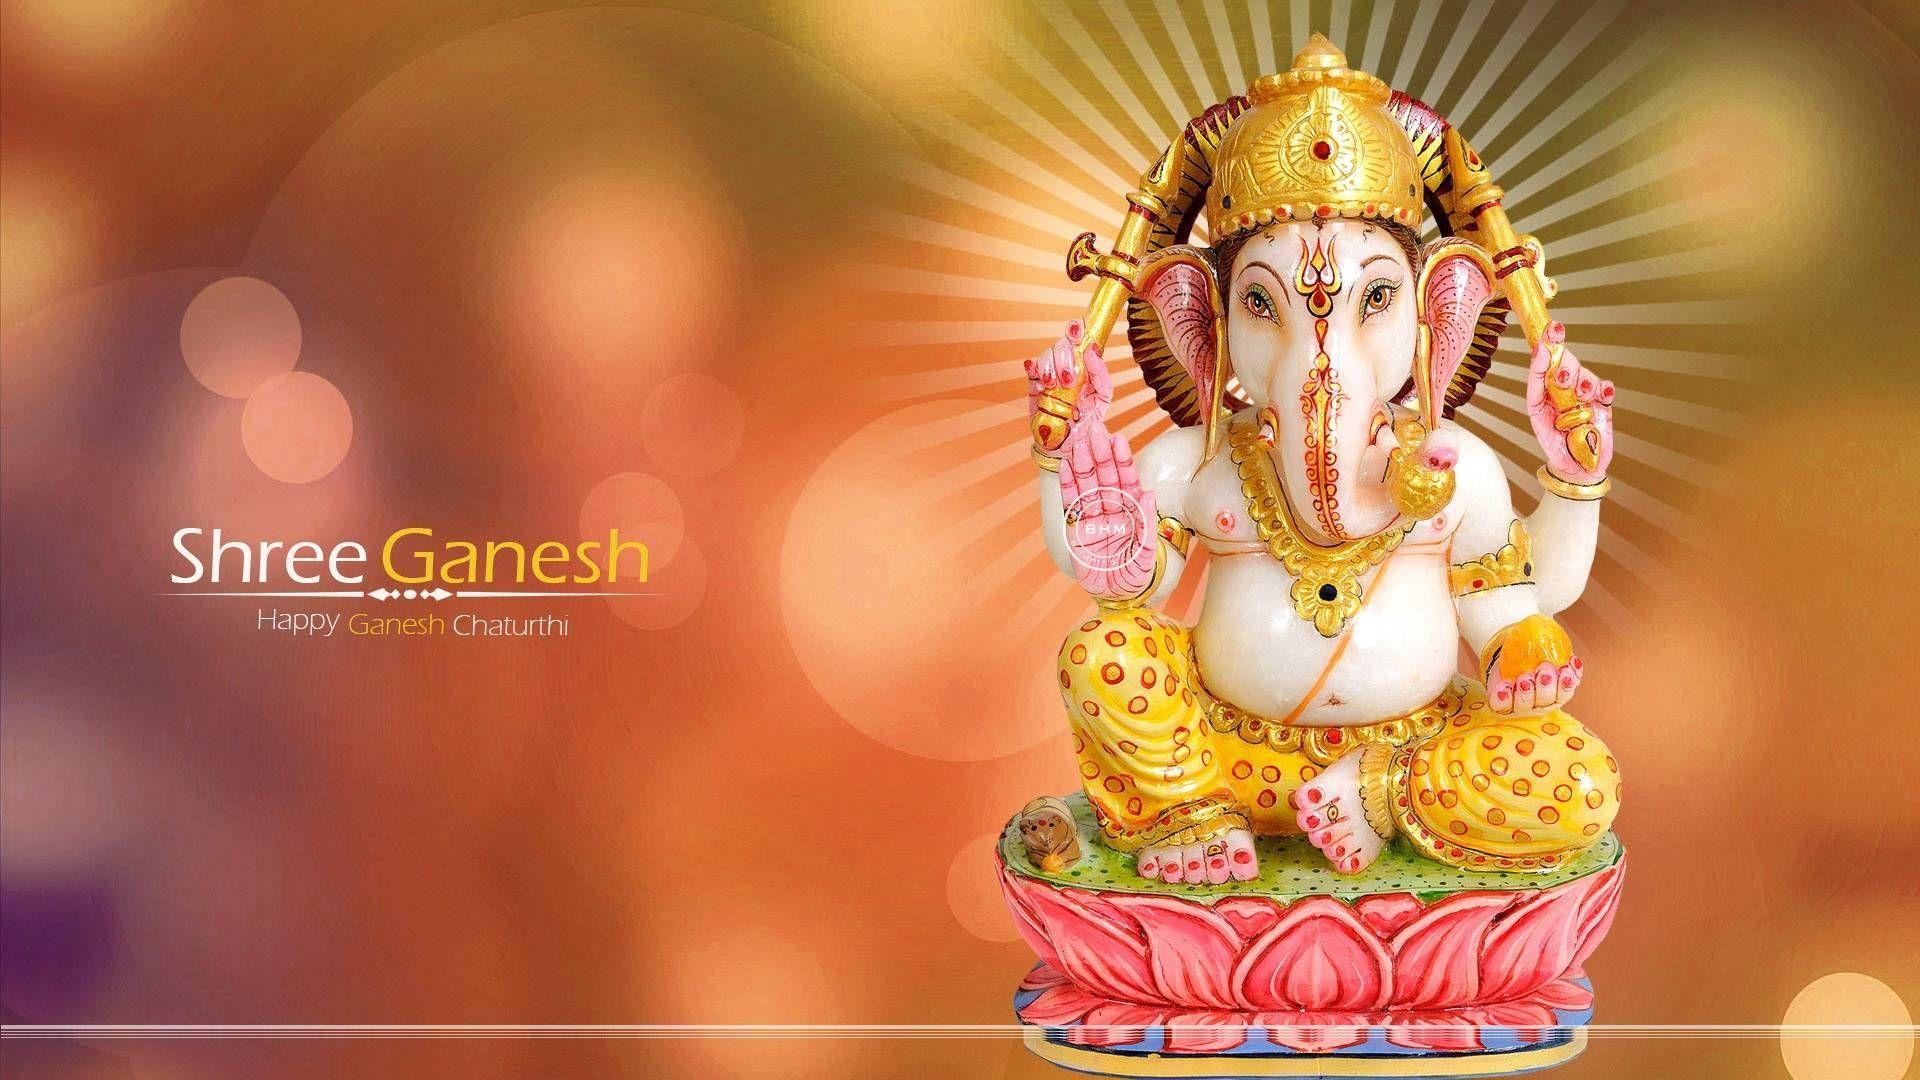 Ganesh Chaturthi Cute Ganesha Images Hd Happy Ganesh Chaturthi Ganesh Chaturthi Images Happy Ganesh Chaturthi Images